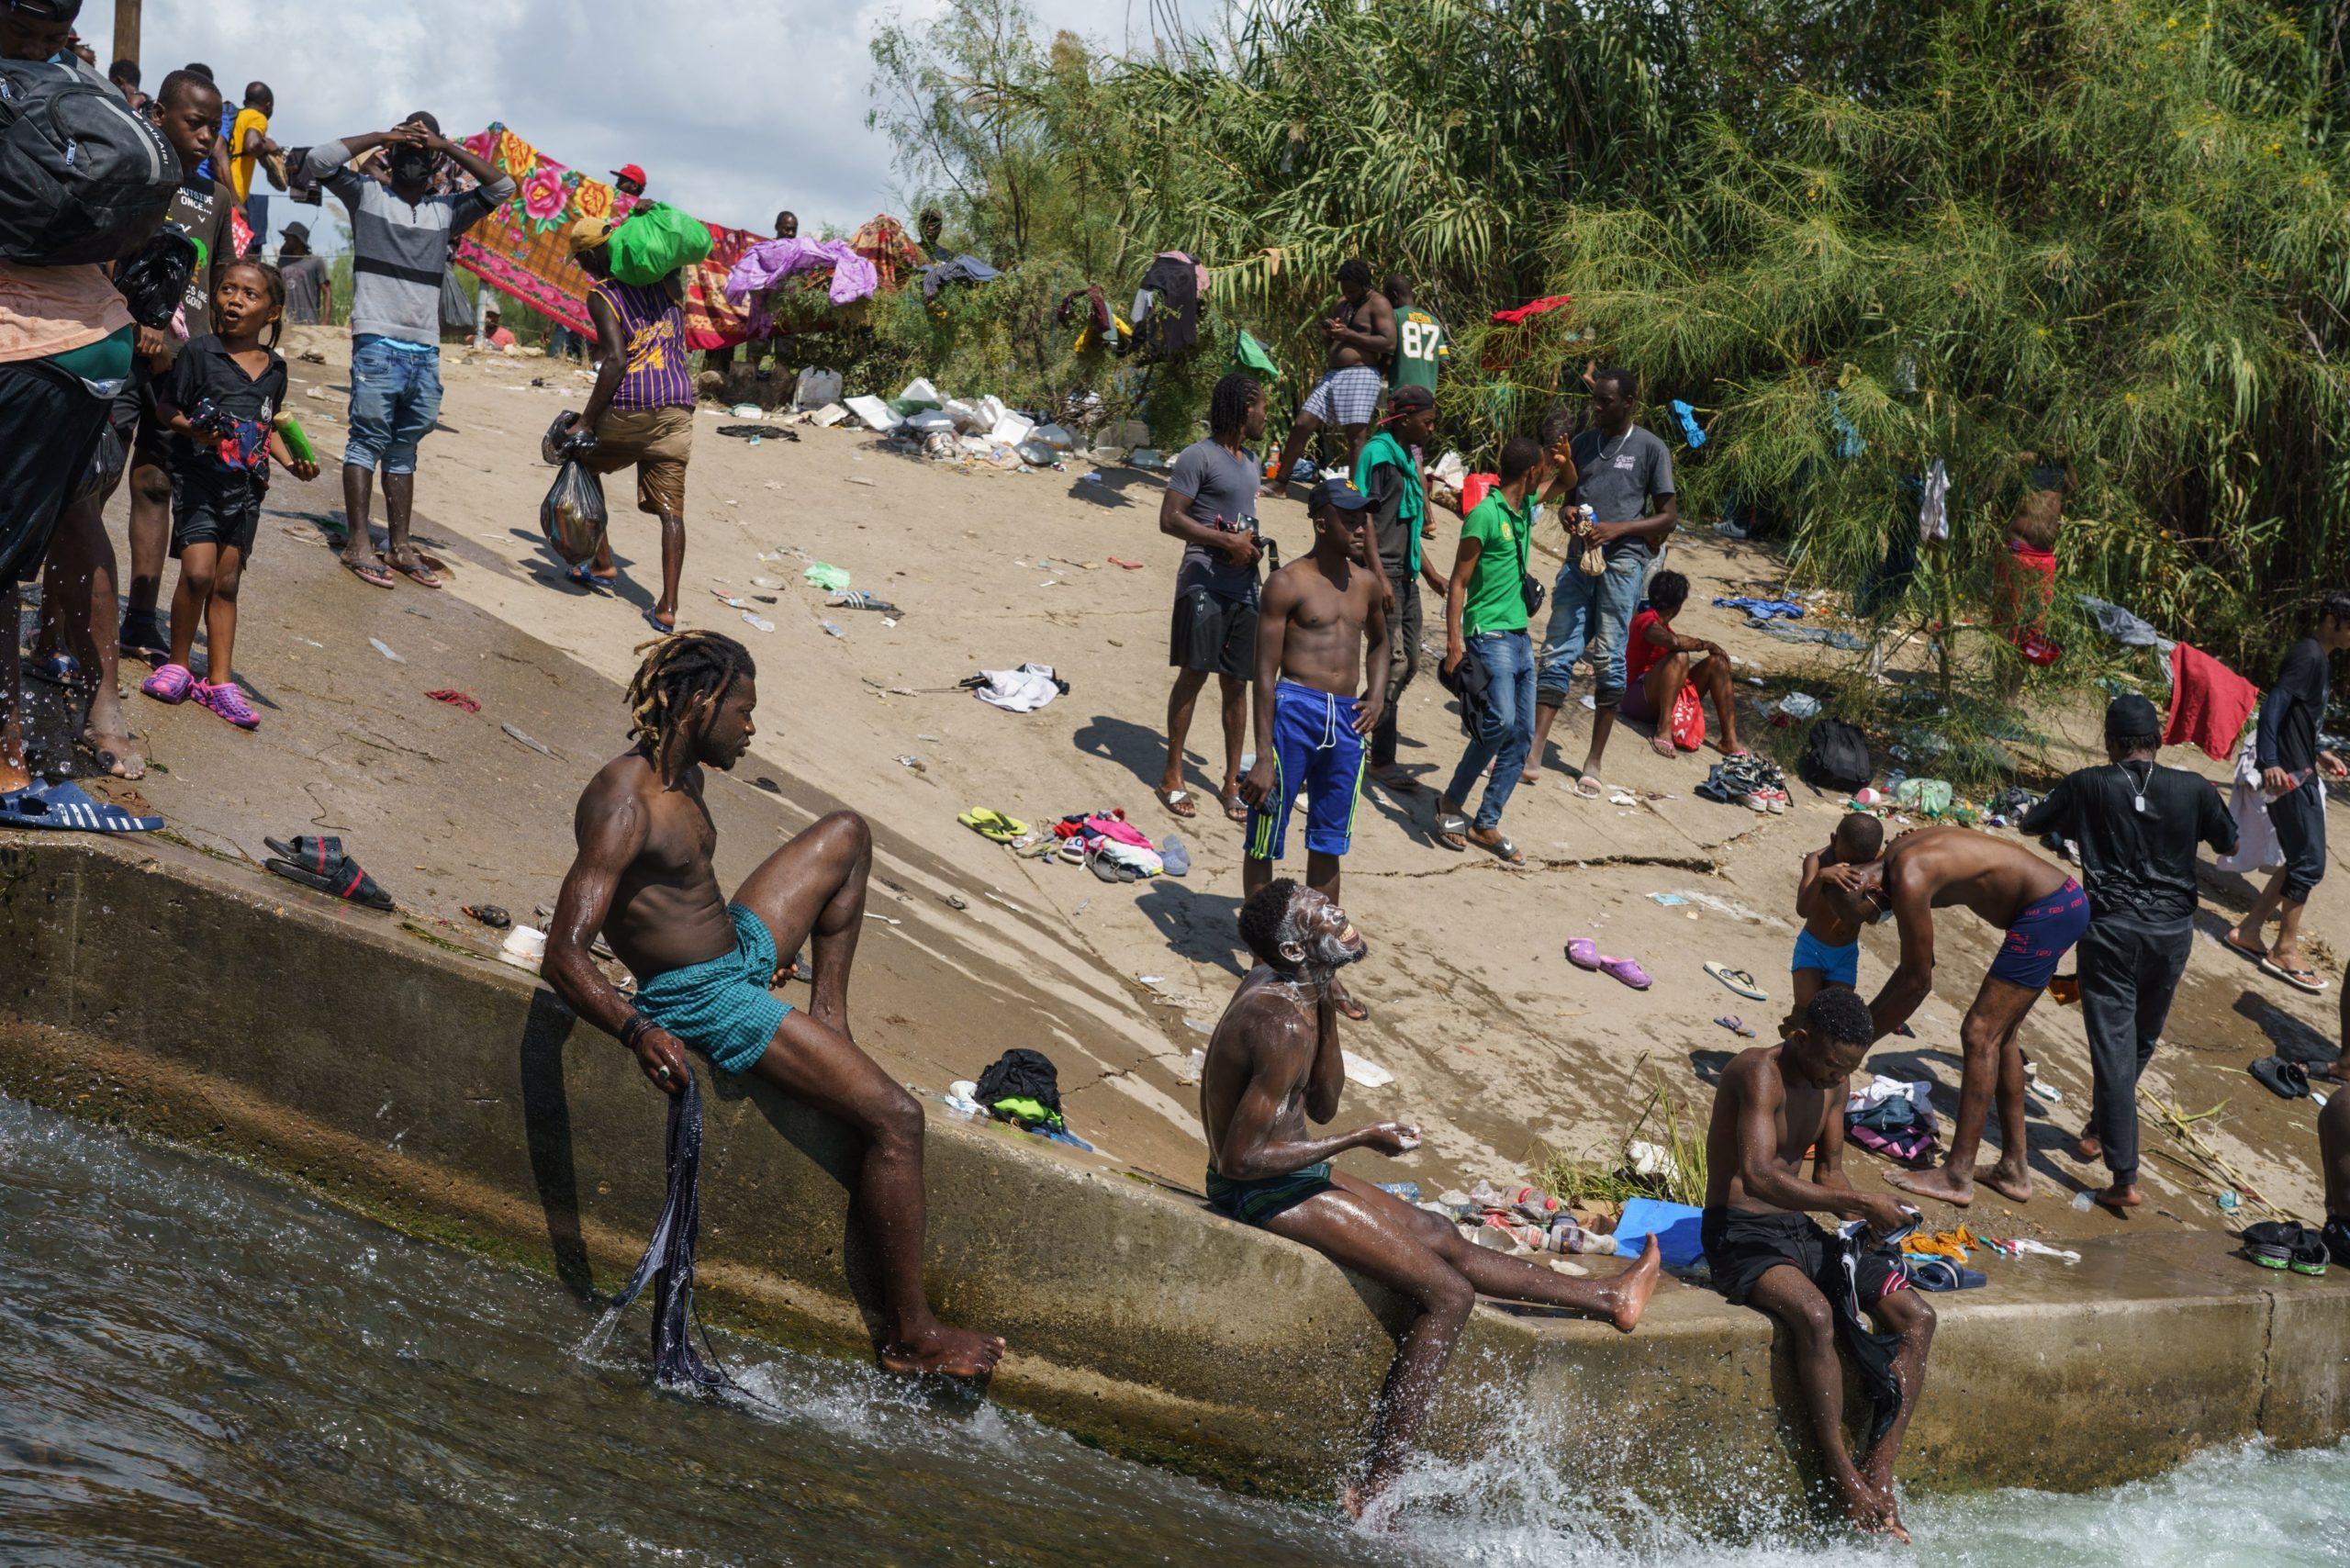 Migrant men bathe in the Rio Grande near the Del Rio-Acuna Port of Entry in Del Rio, Texas, on September 18, 2021. (Photo by PAUL RATJE/AFP via Getty Images)